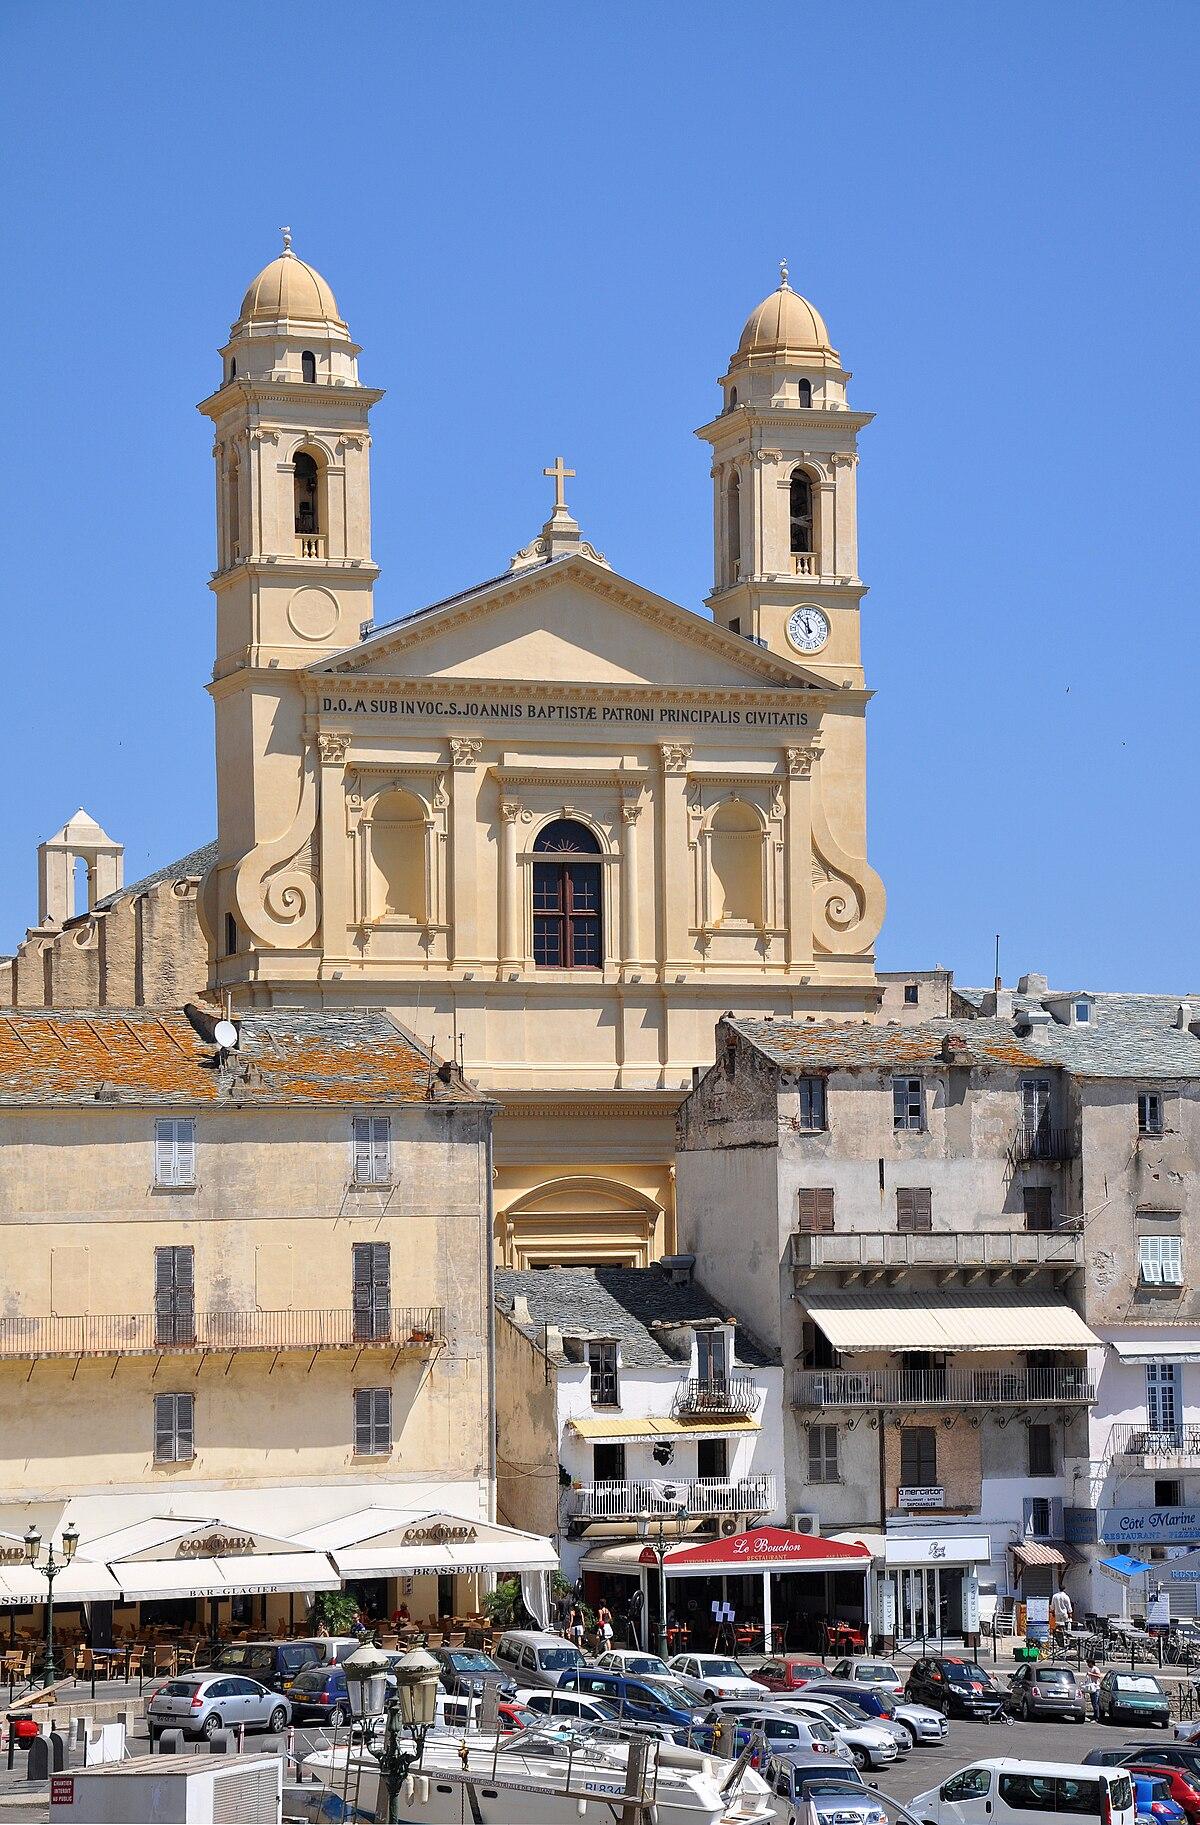 Glise saint jean baptiste de bastia wikip dia for Maison de la literie bastia